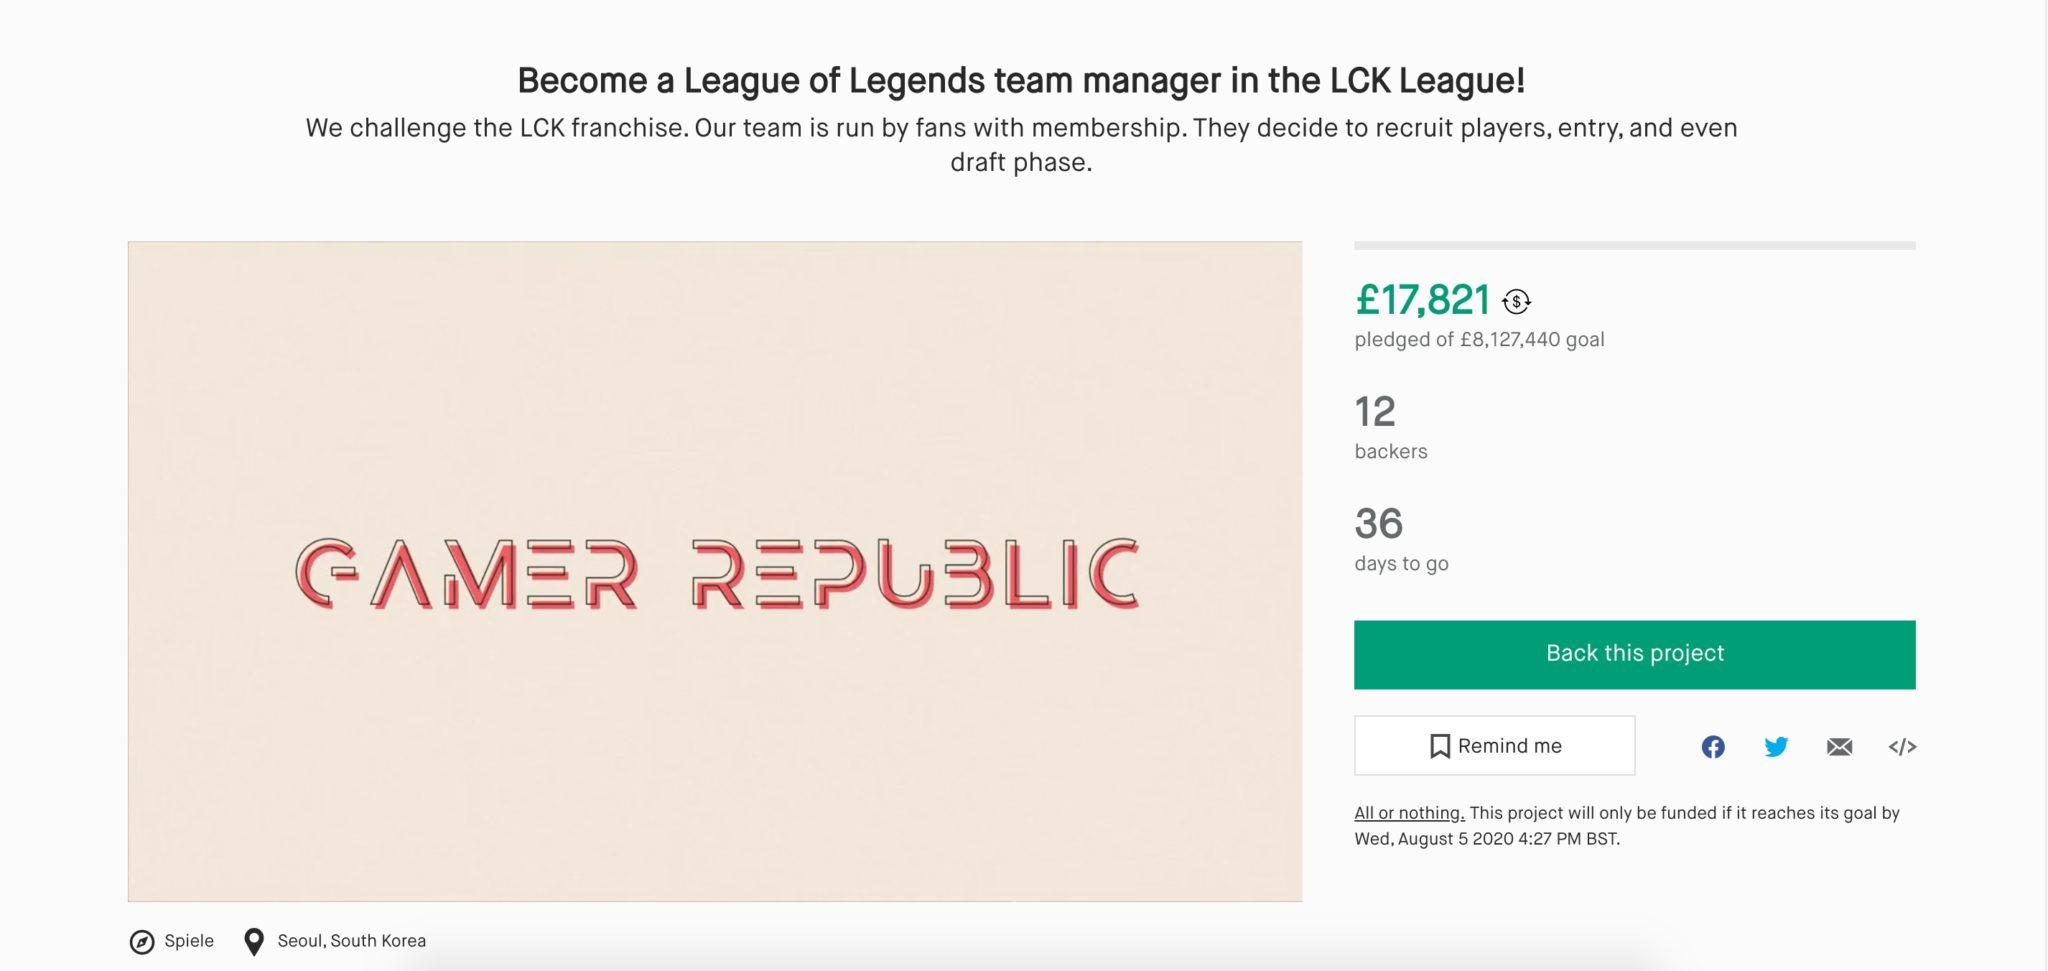 gamer republic kickstarter for $20m to join LCK